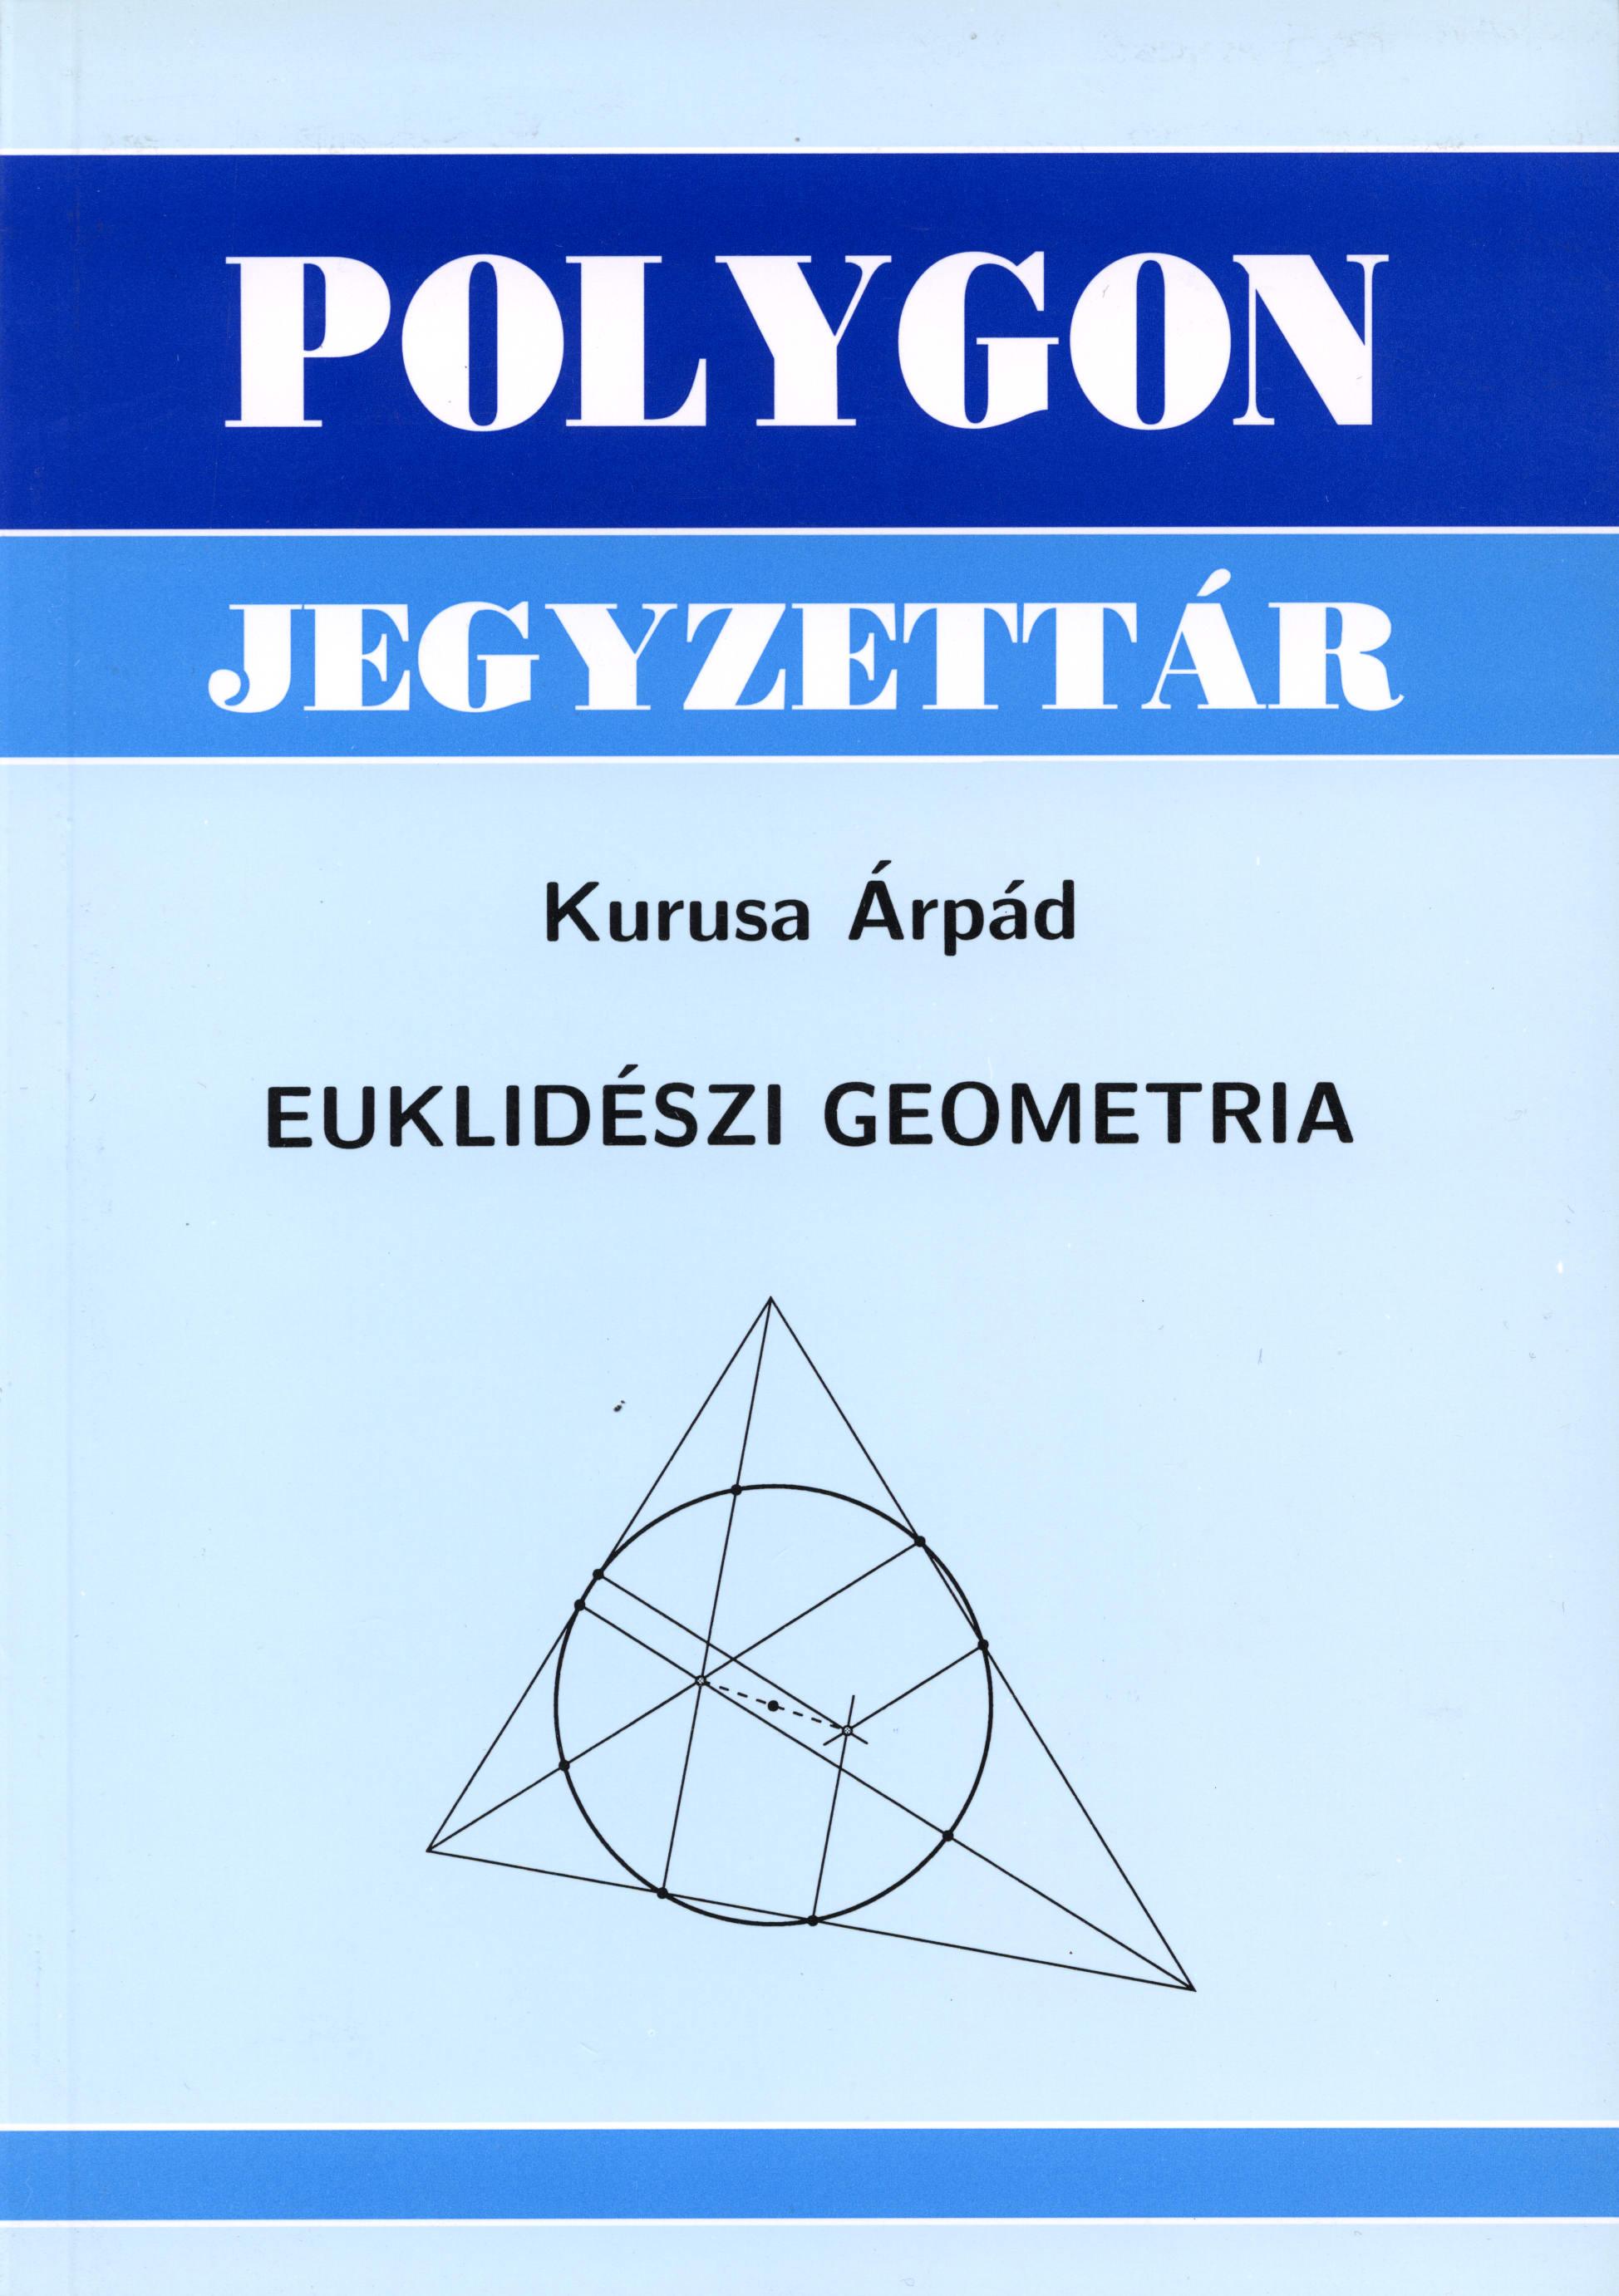 Euklidészi geometria - Polygon jegyzet